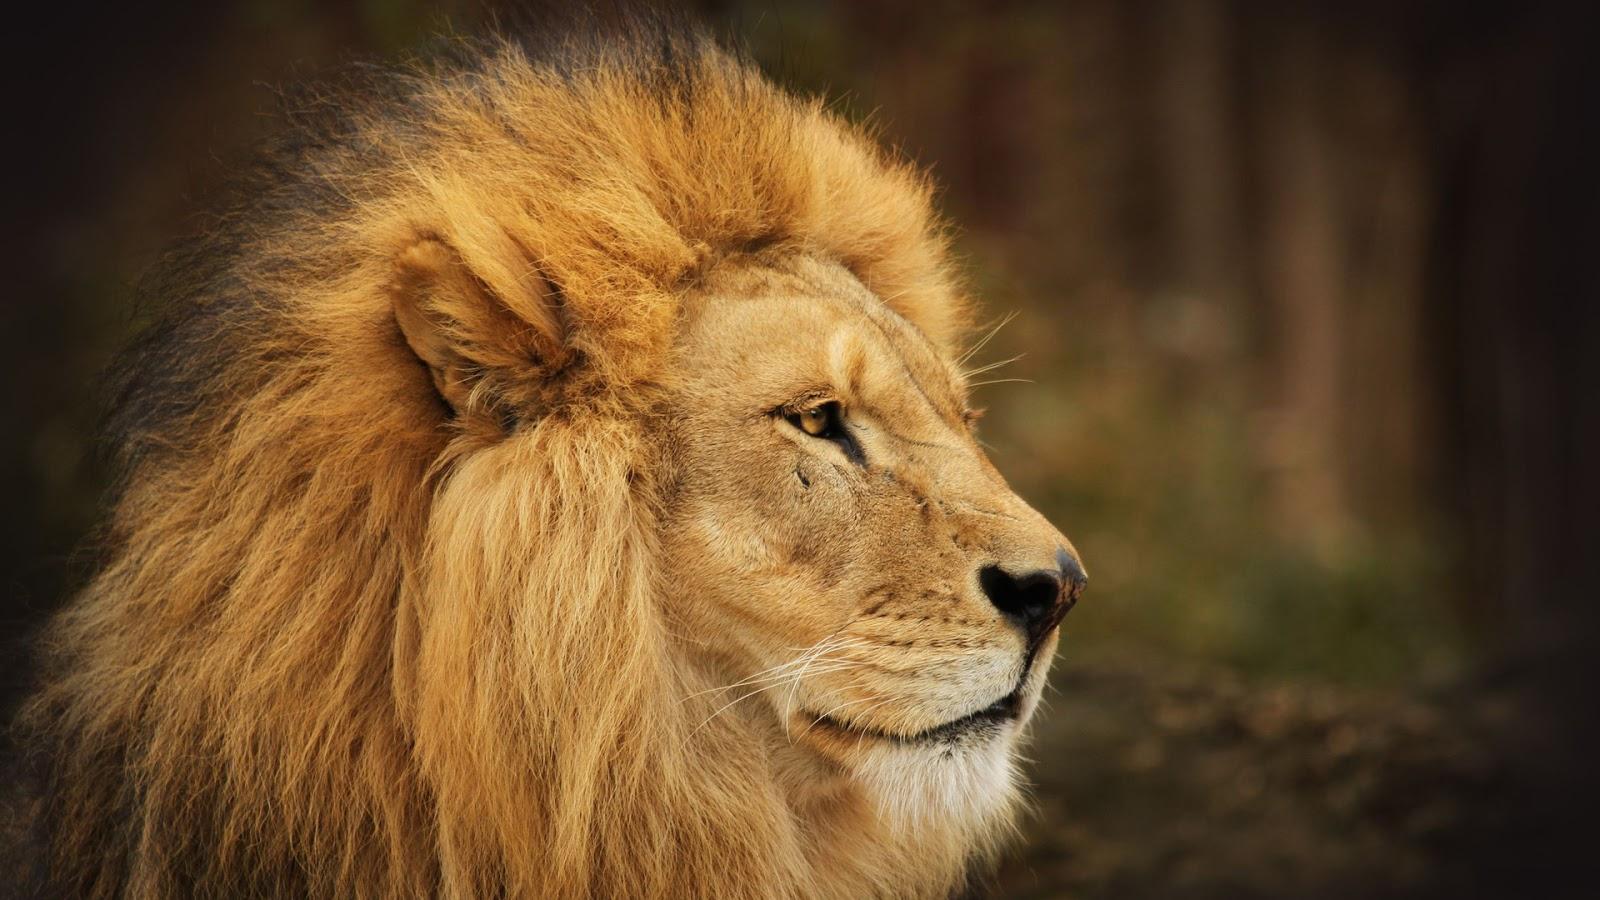 HD Wallpapers: Beautiful Lion